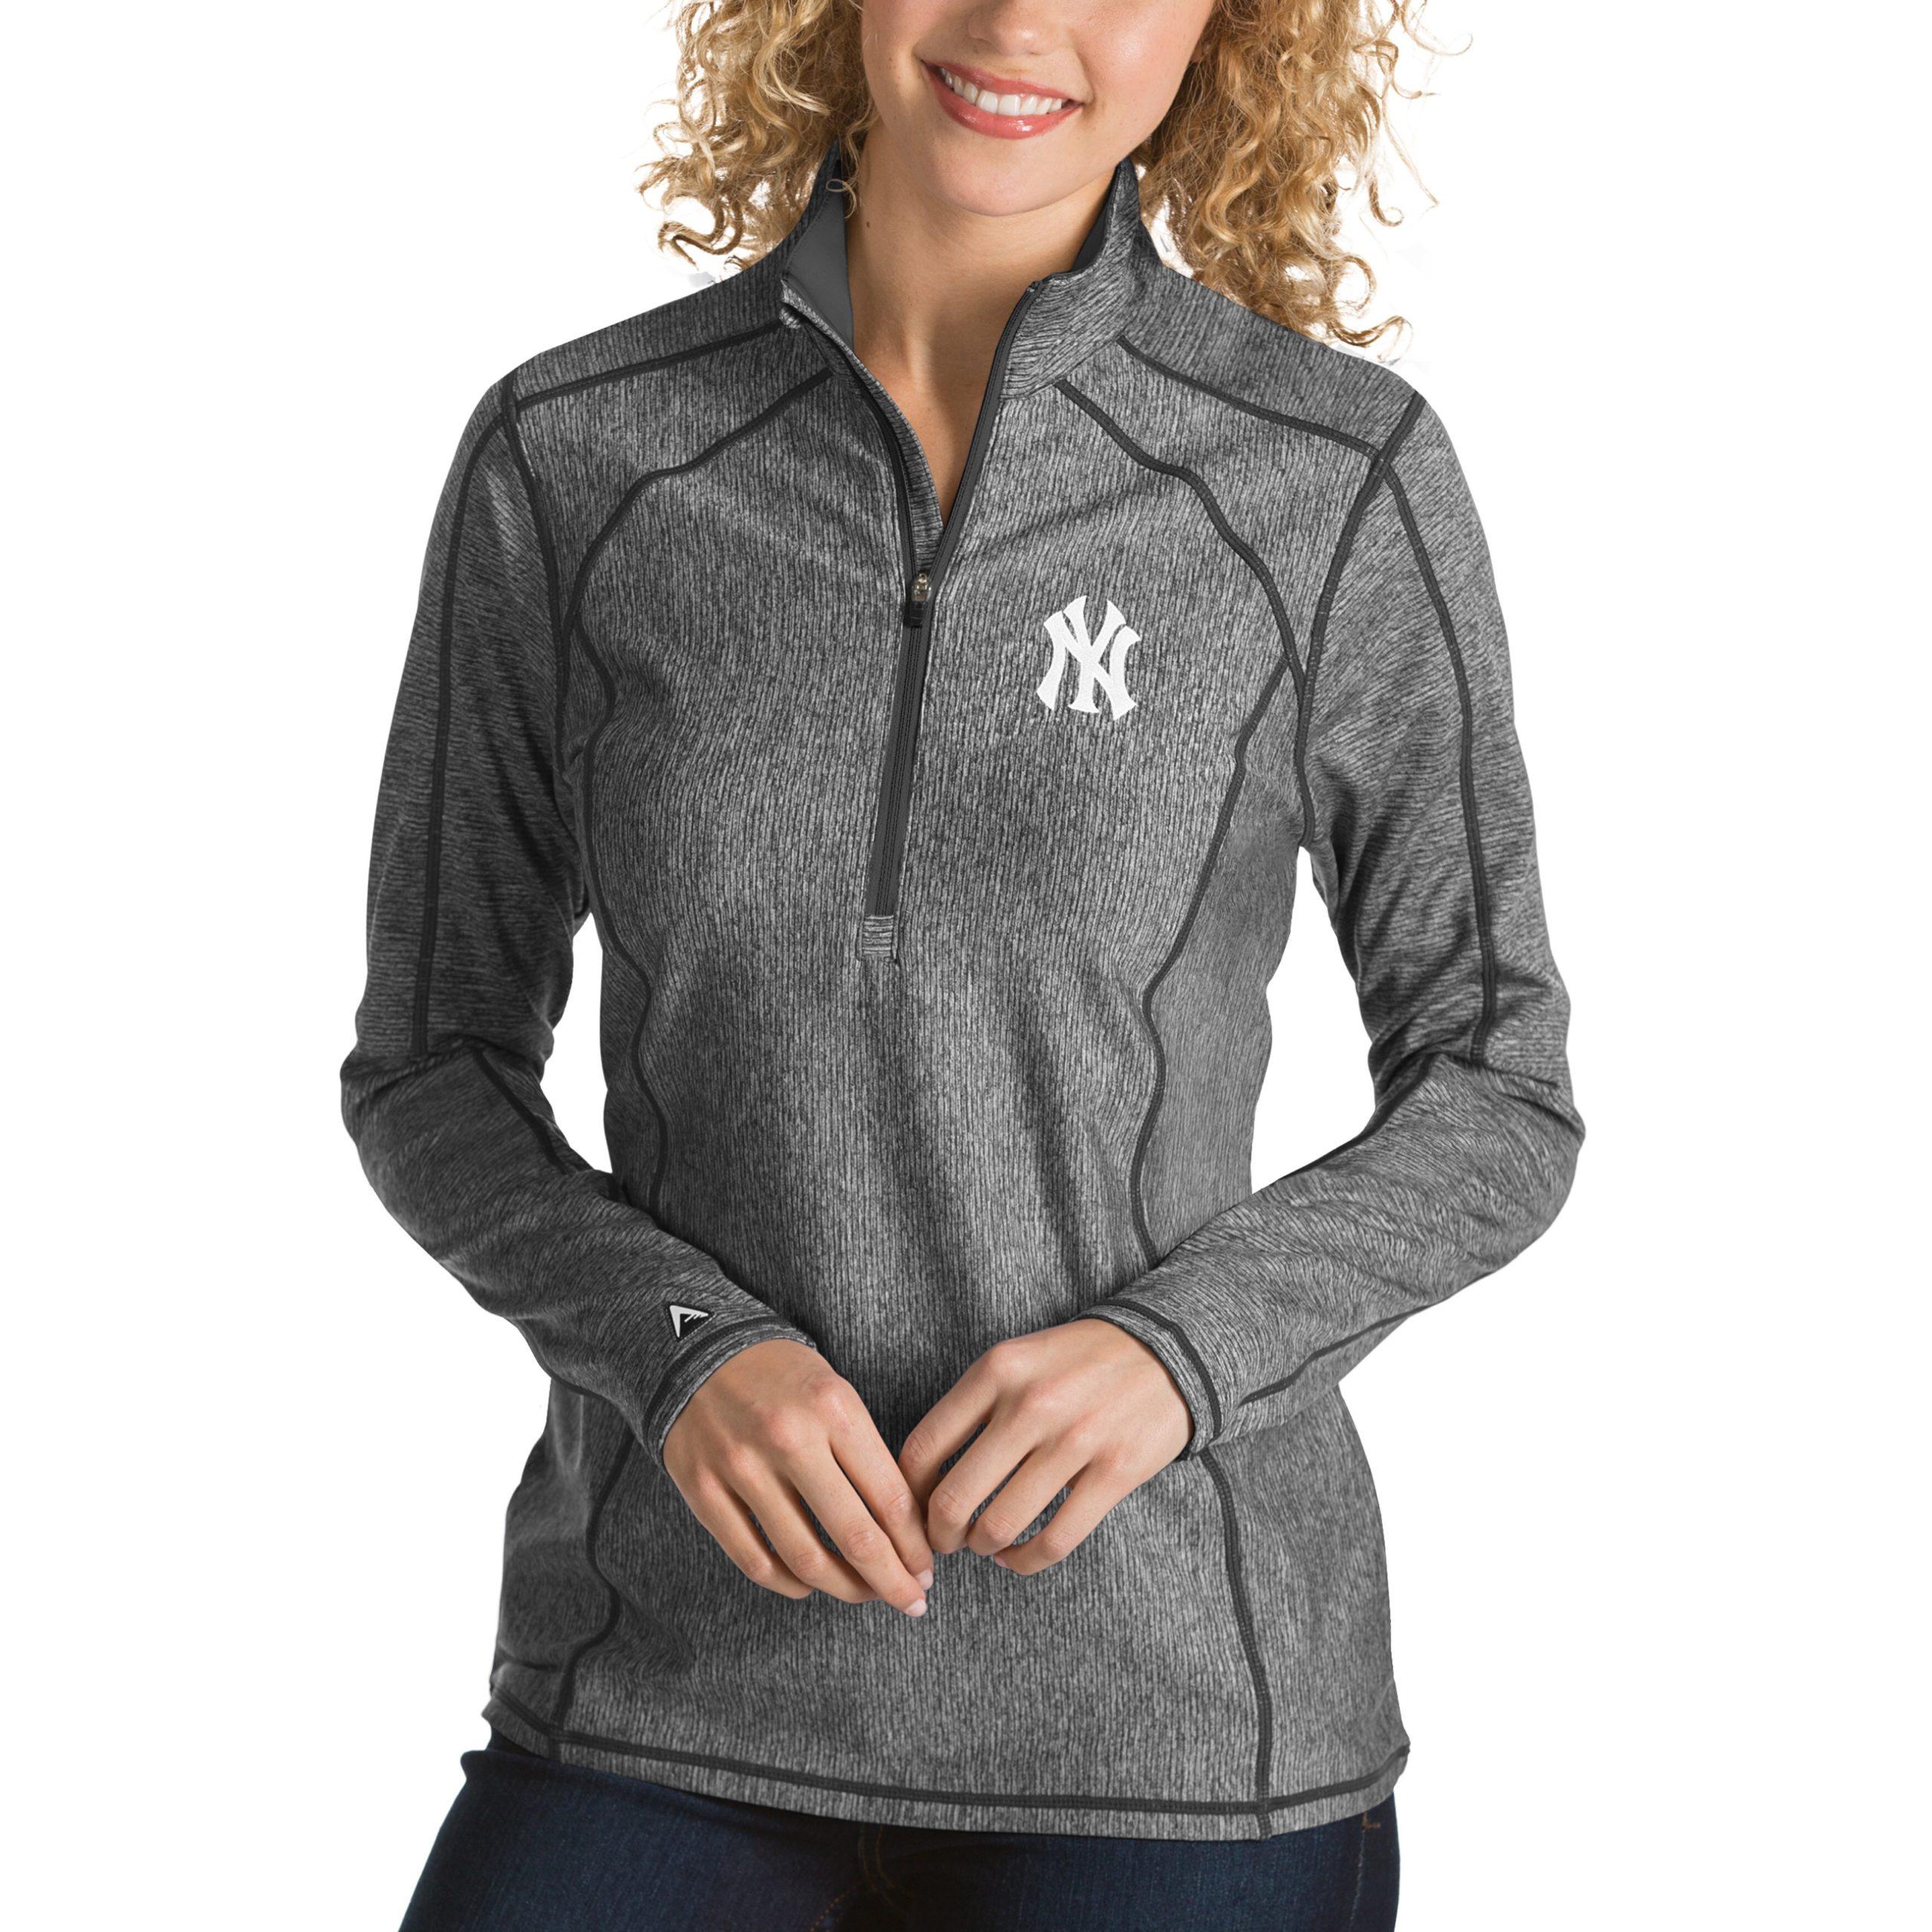 New York Yankees Antigua Women's Tempo Desert Dry 1/4-Zip Pullover Jacket - Heathered Charcoal